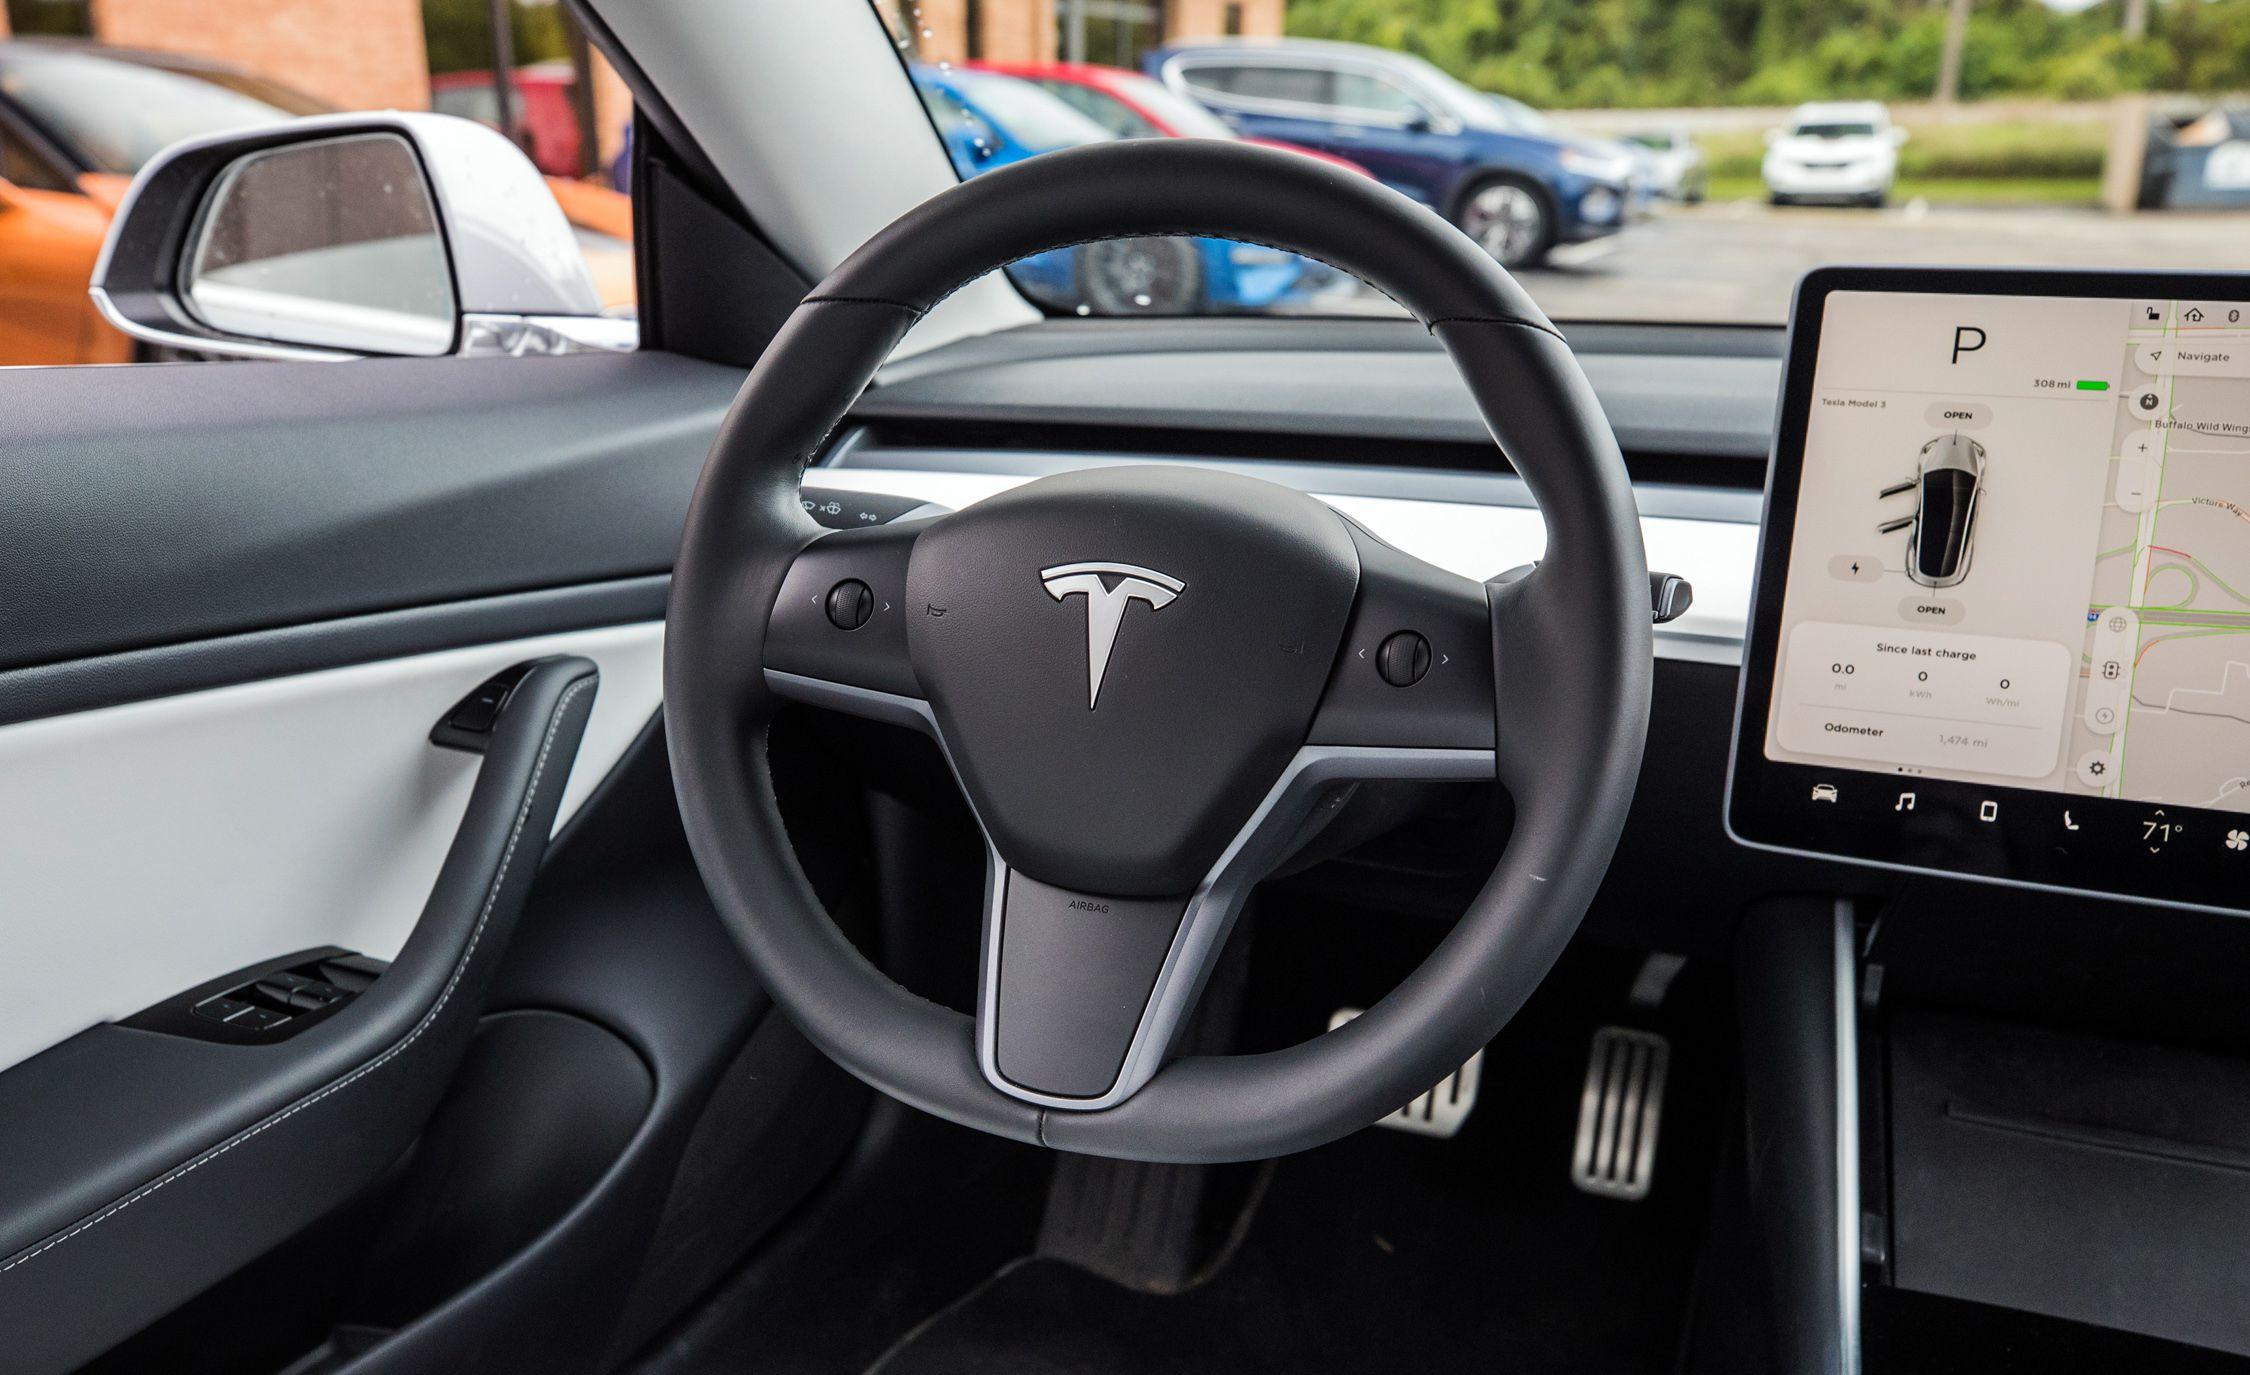 Volante e sistema do Model 3 da Tesla